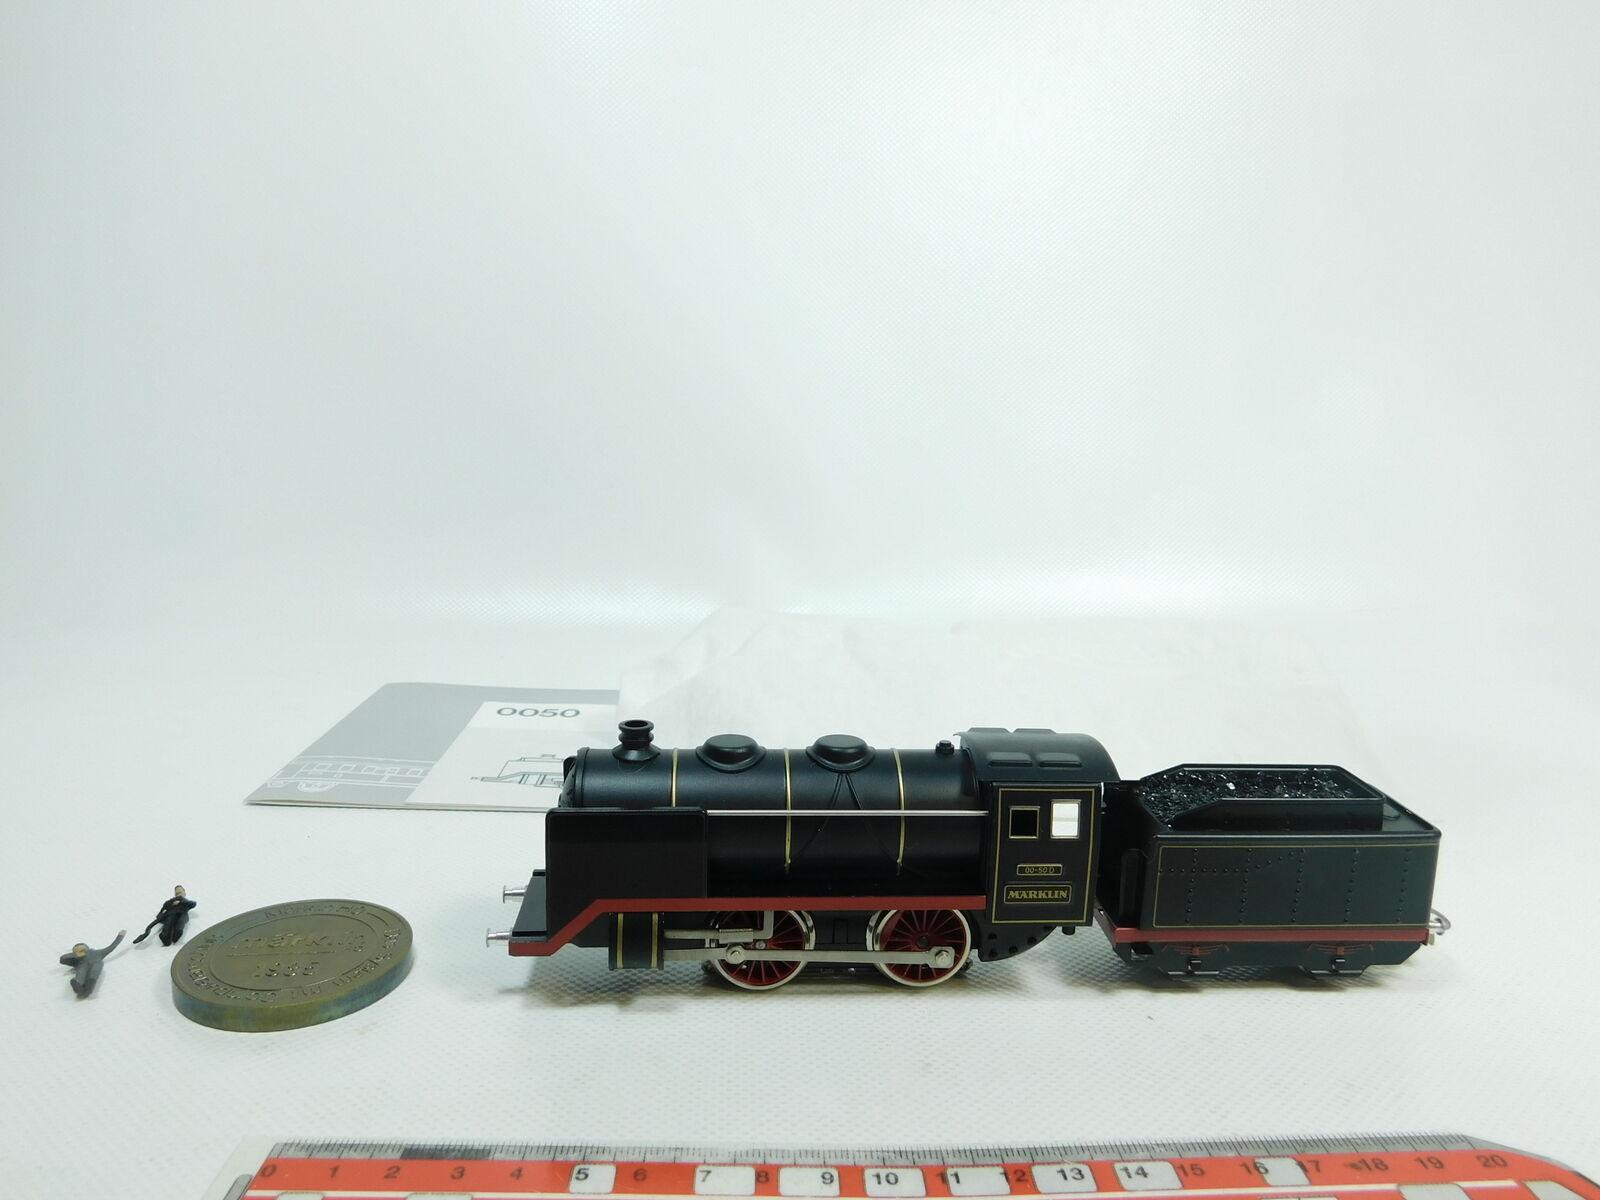 Bh140-1Märklin h0 ac locomotora a vapor 00-50 d (de set 0050), muy bien